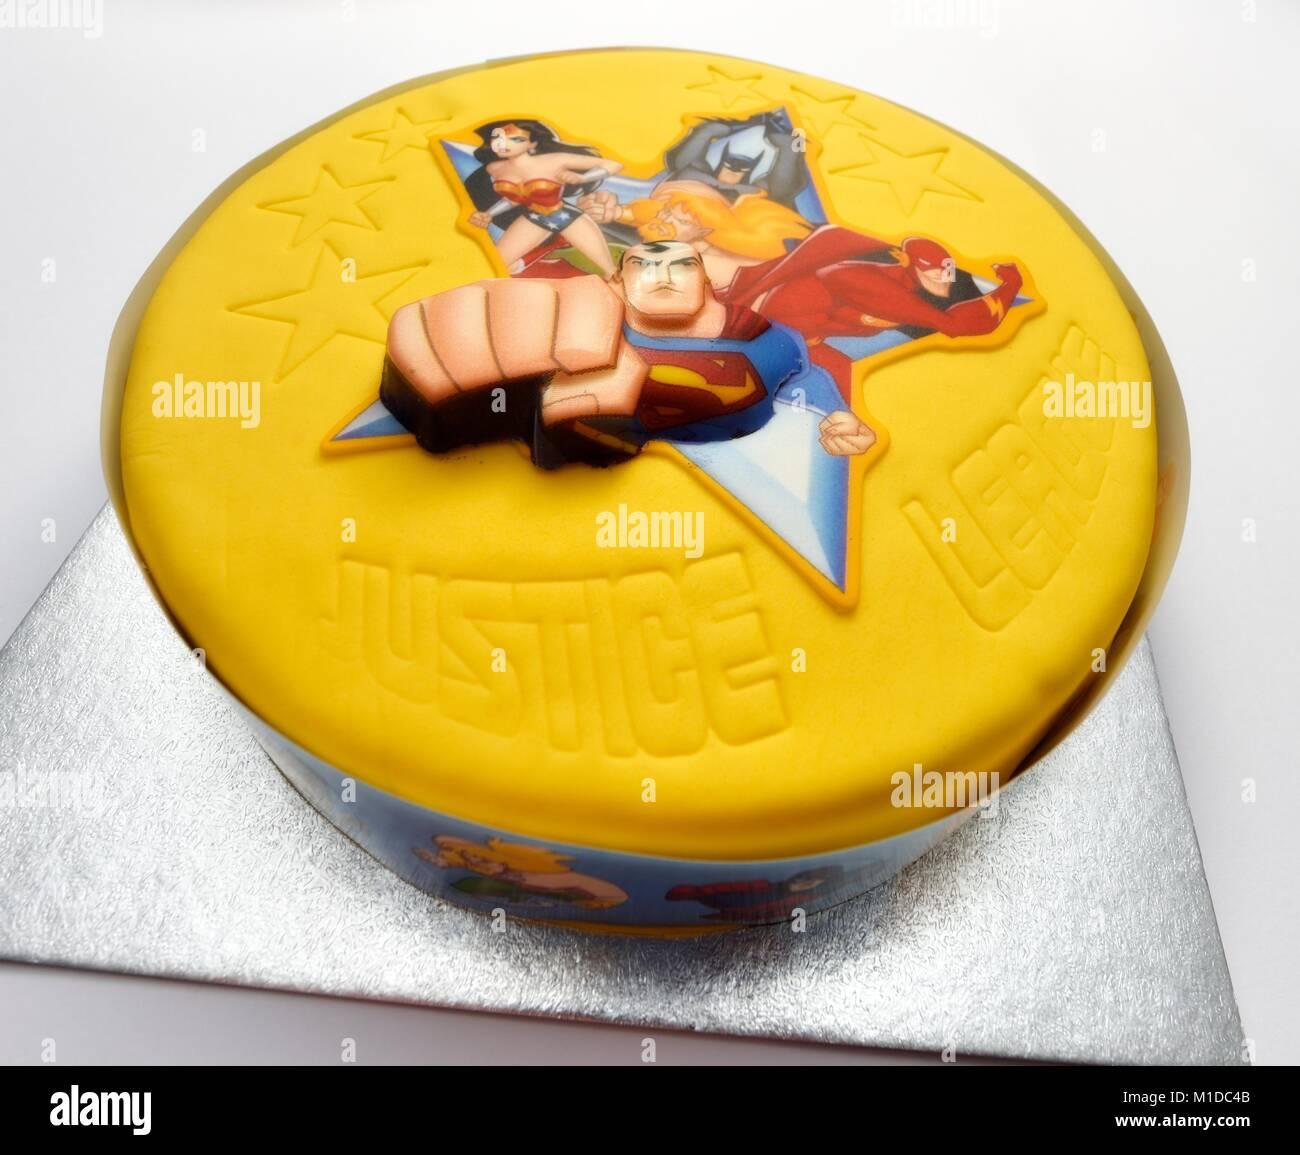 Pleasant Superhero Birthday Cake Stock Photo 173013243 Alamy Funny Birthday Cards Online Kookostrdamsfinfo